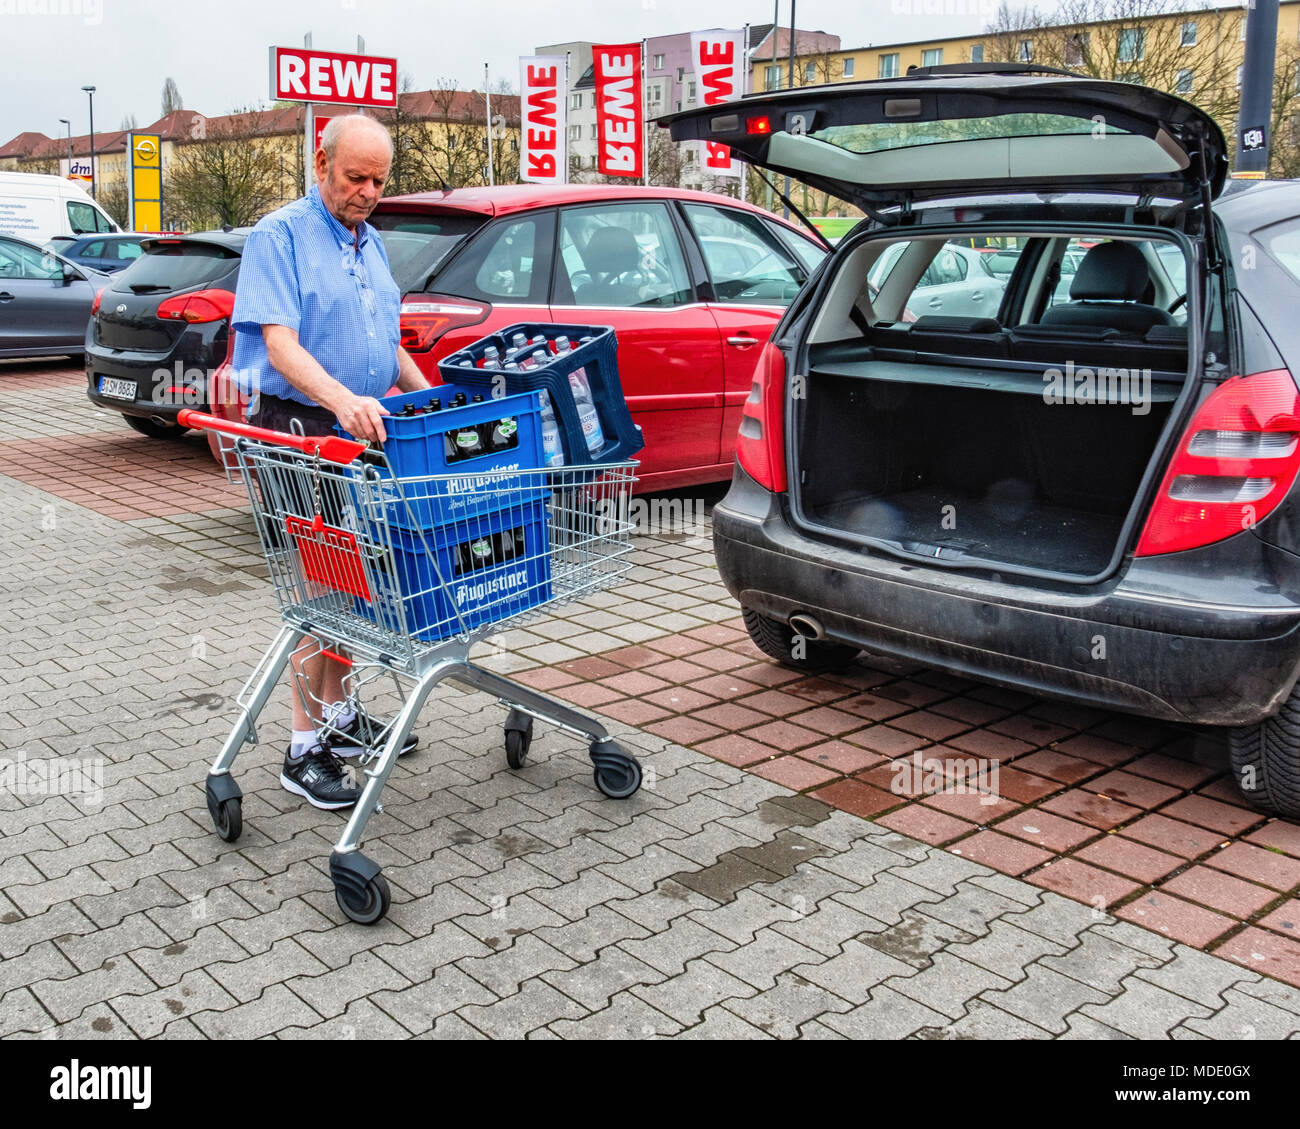 Berlin, Germany. Elderly senior man returning empty bottles to supermarket. Bottle recycling,recycles bottles,pfand deposit system - Stock Image